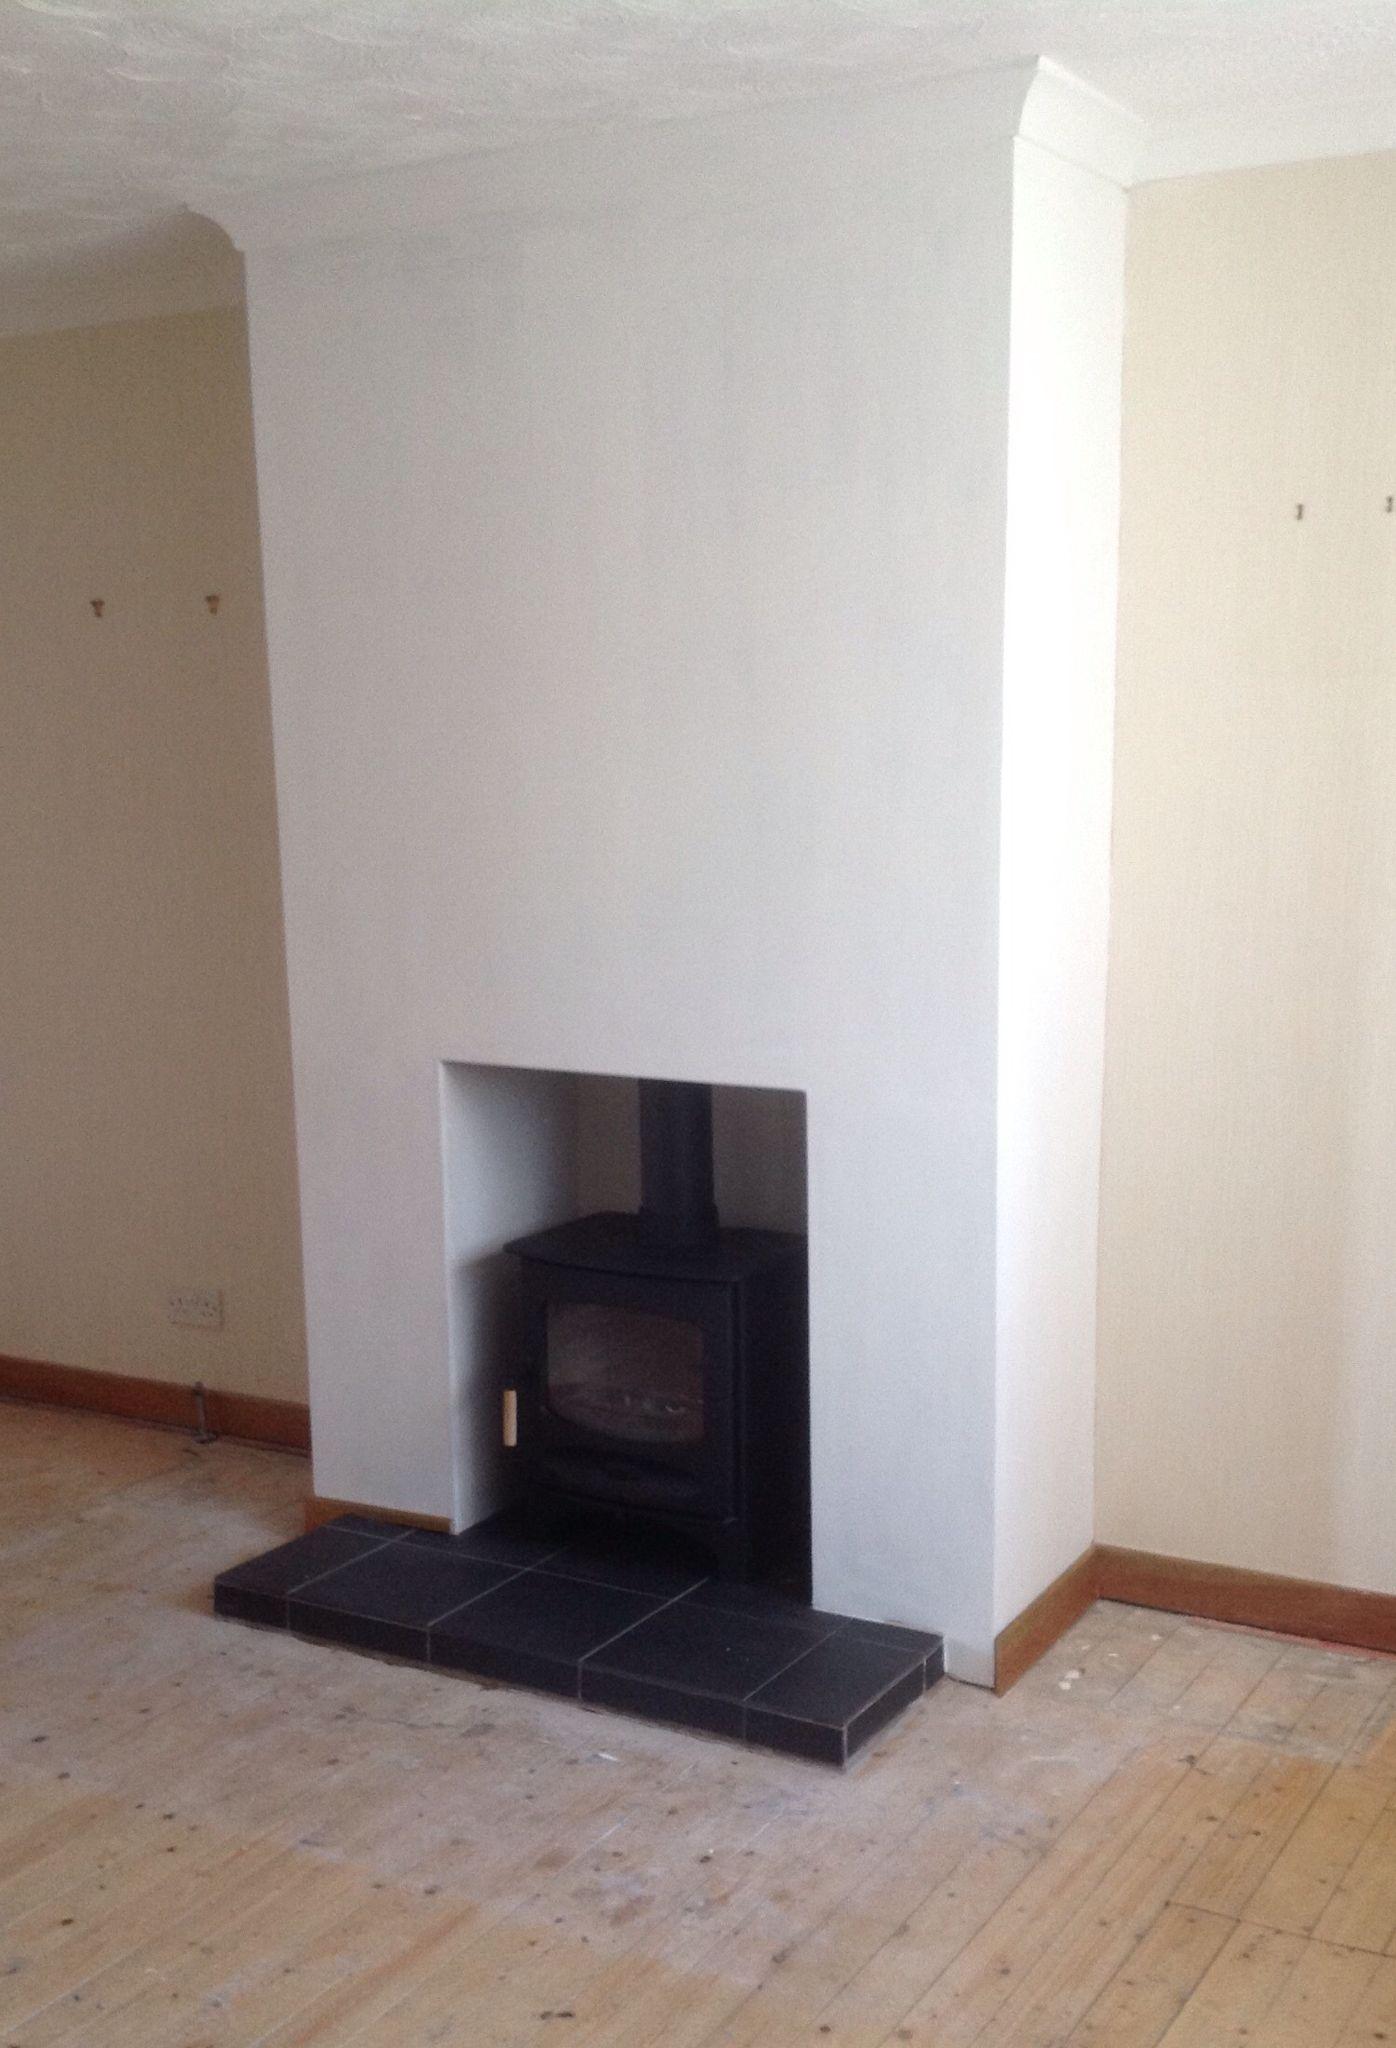 Ready for the carpet | Our new wood burner | Pinterest | Wood burner ...